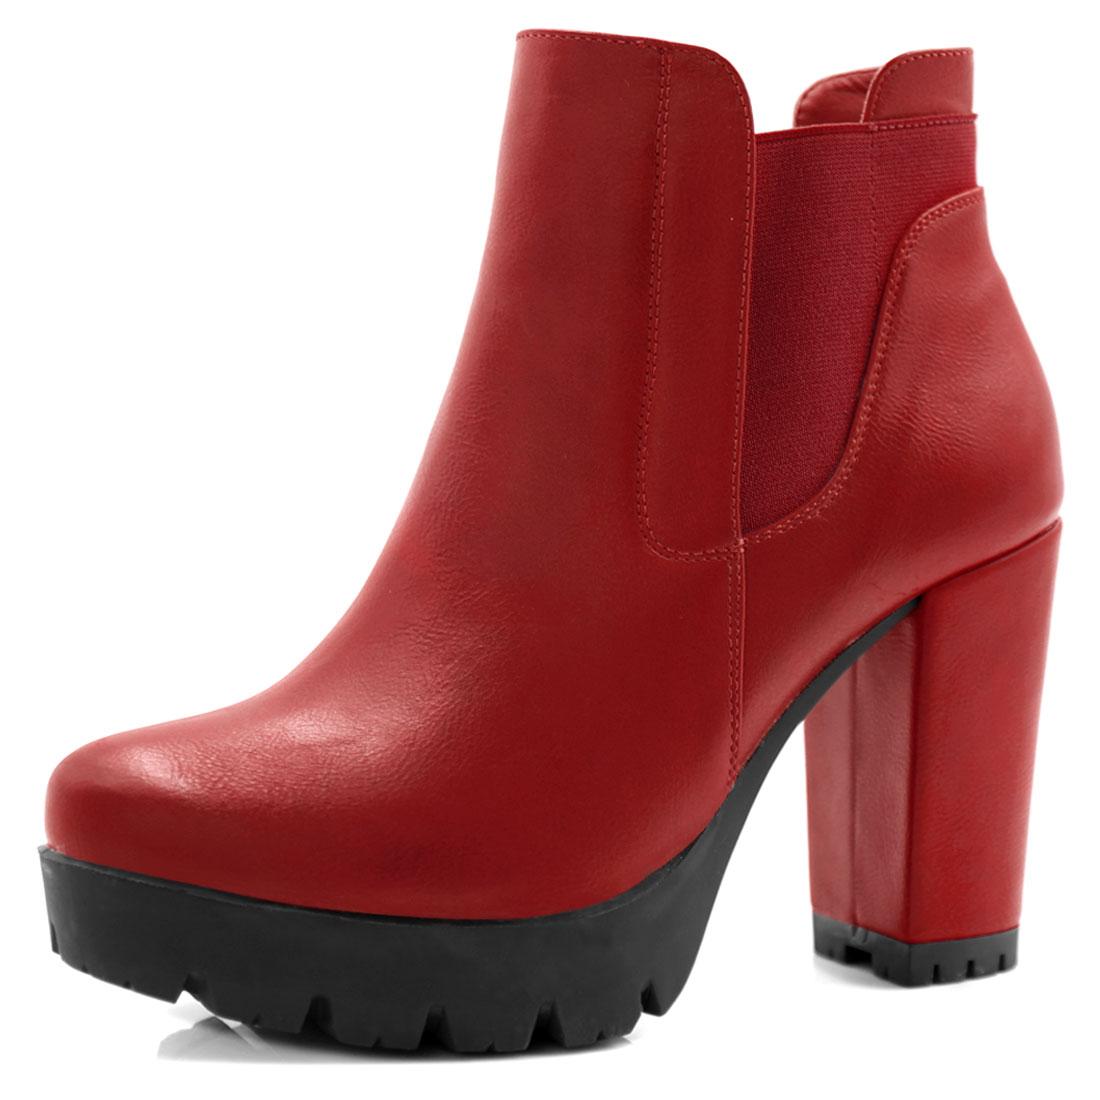 Allegra K Women Chunky High Heel Platform Zipper Chelsea Boots Red US 6